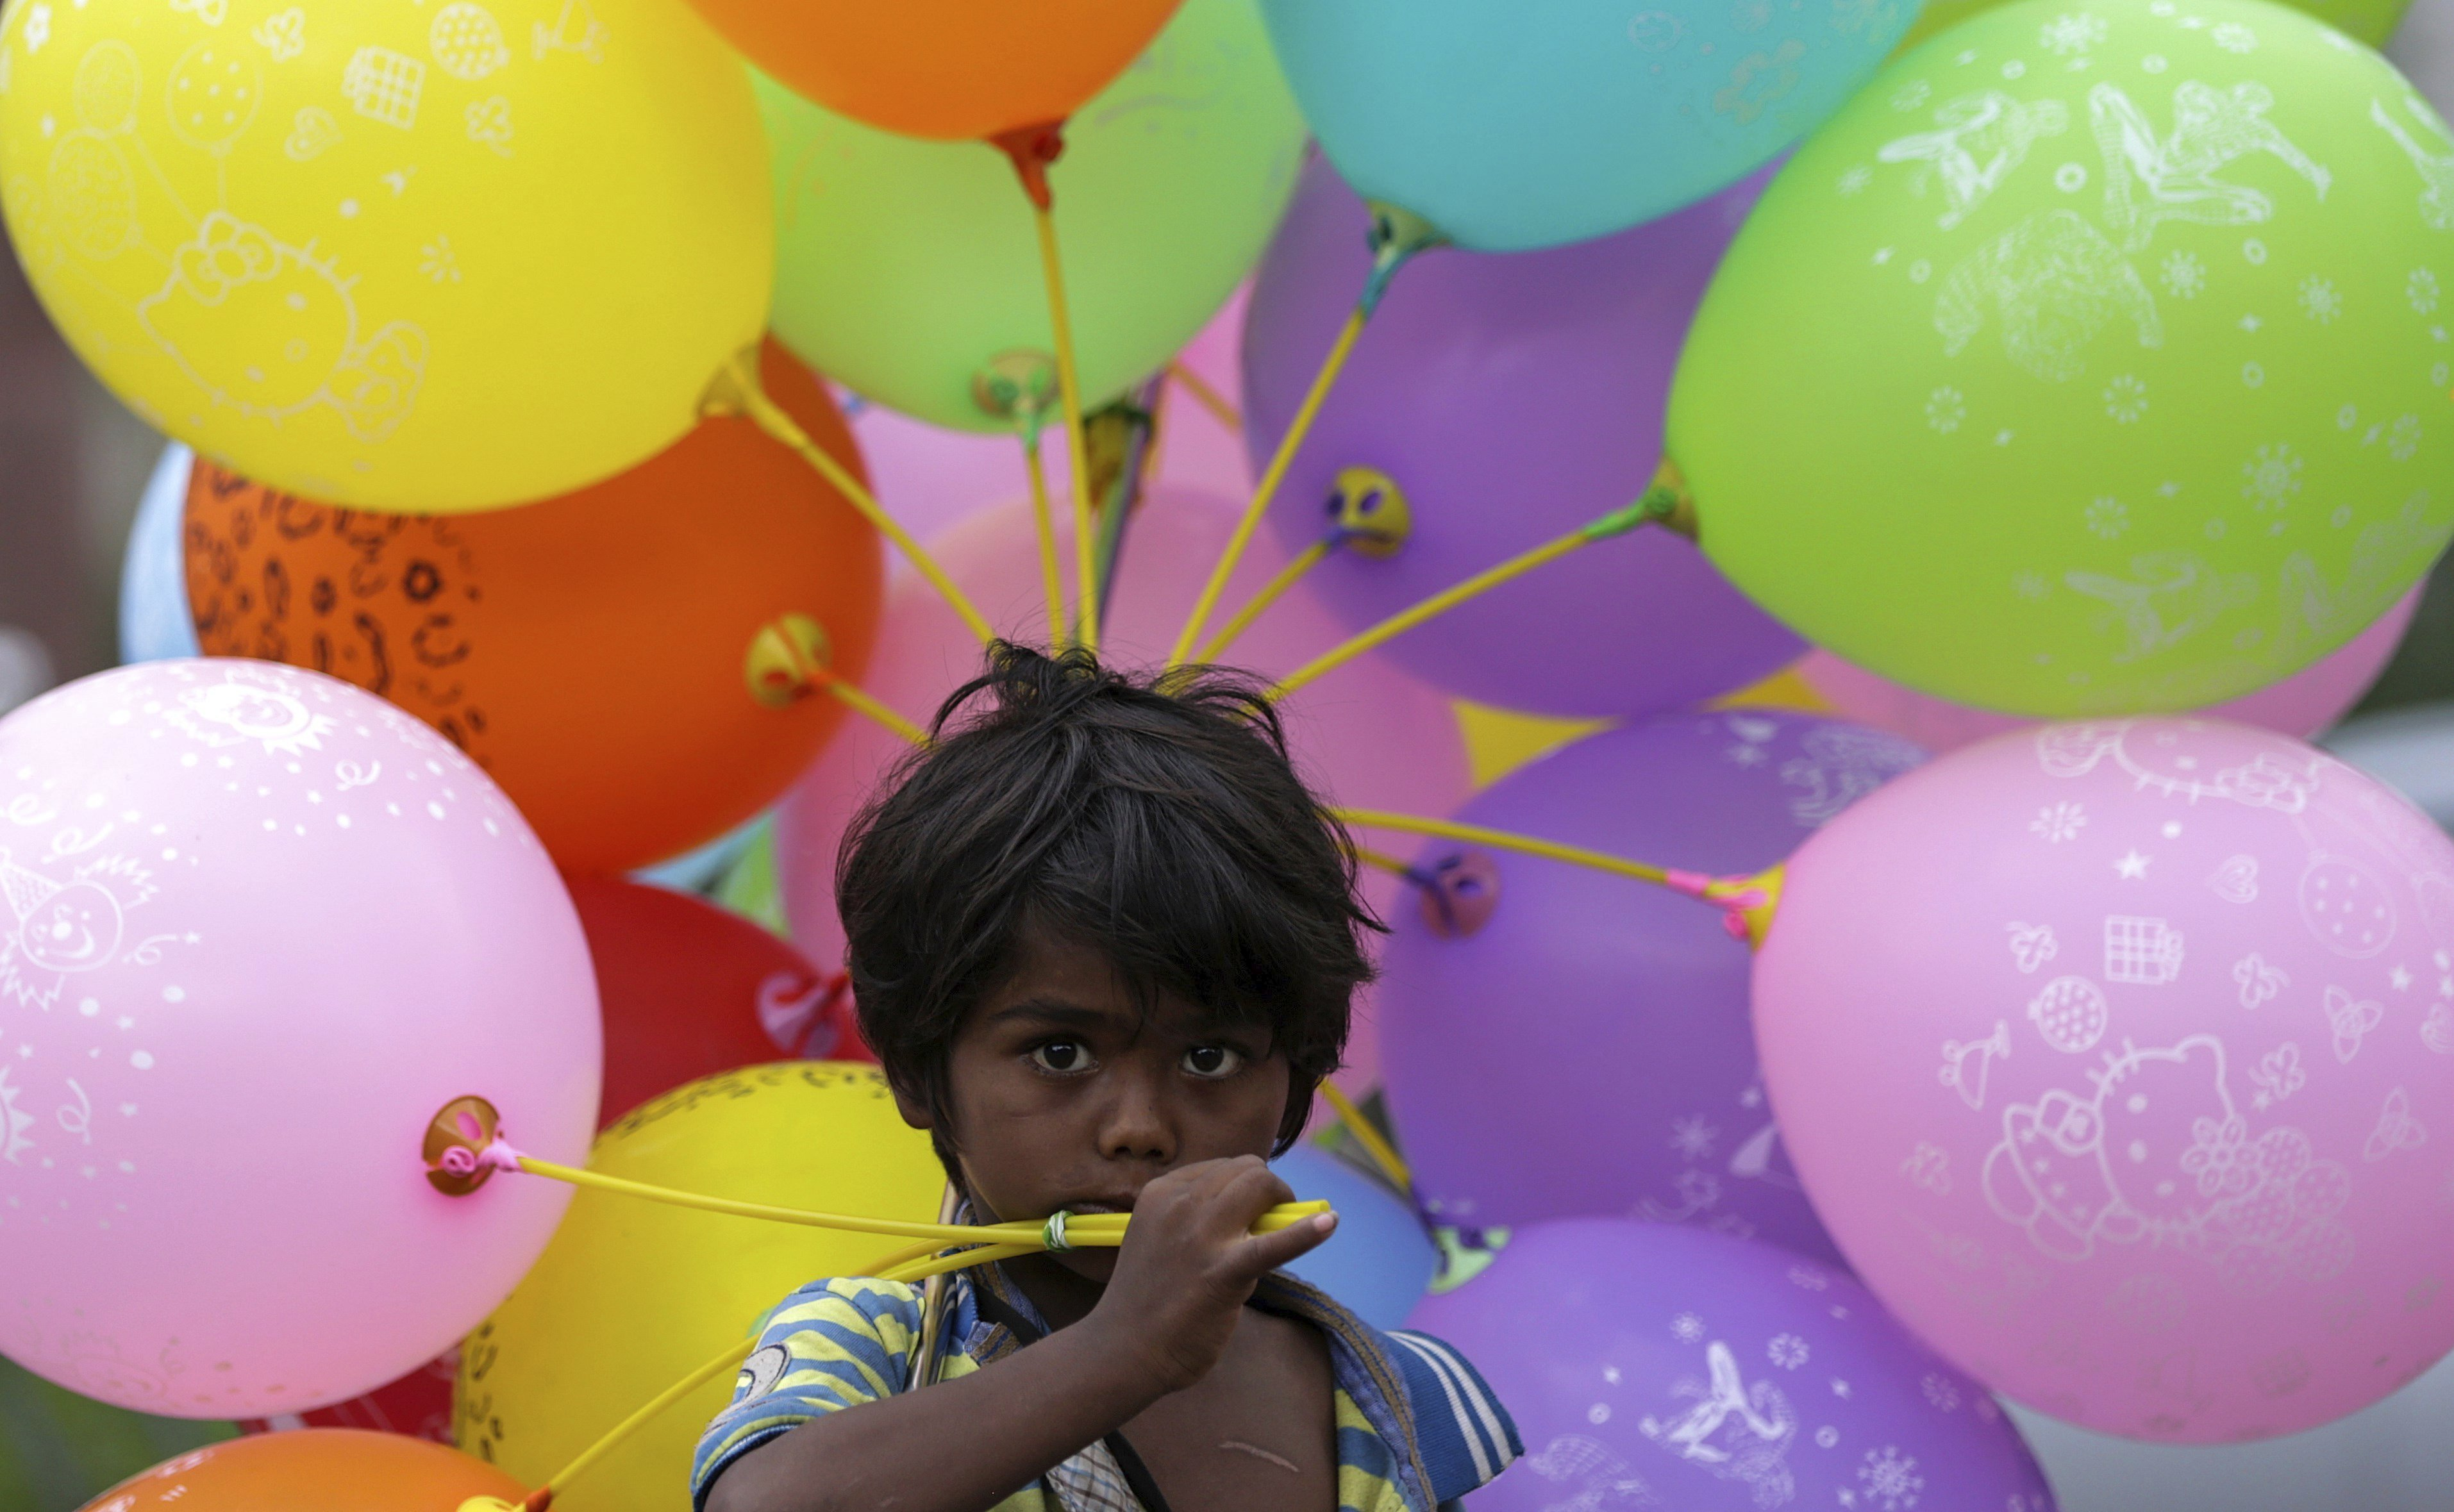 Un nin de sis anys ven globus en un carrer de Bombai, Índia. /DIVYAKANT SOLANKI